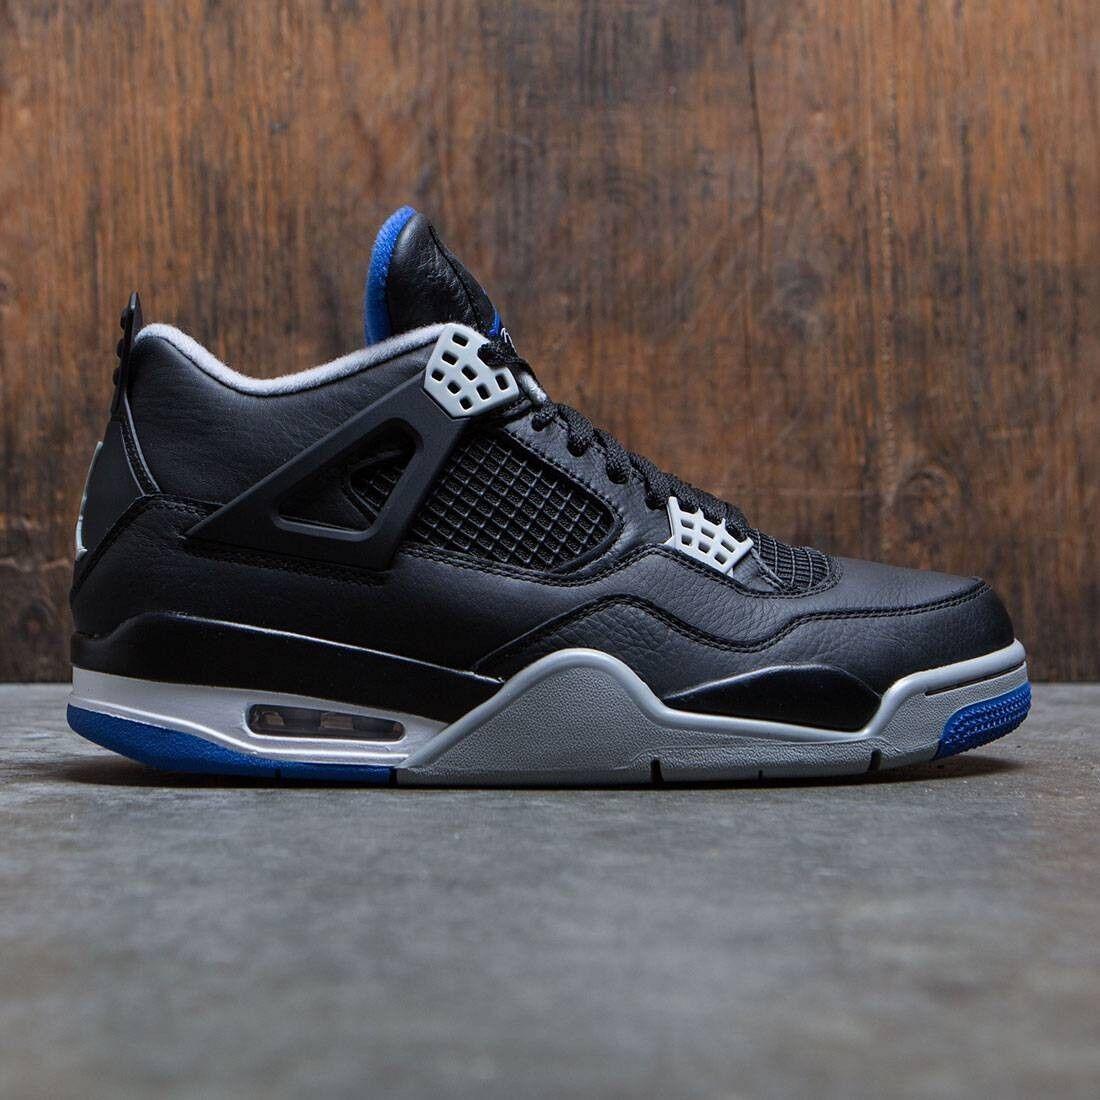 2018 Nike Air Jordan 4 IV Retro Motorsport Alternate Size 13. 308497-006 1 2 3